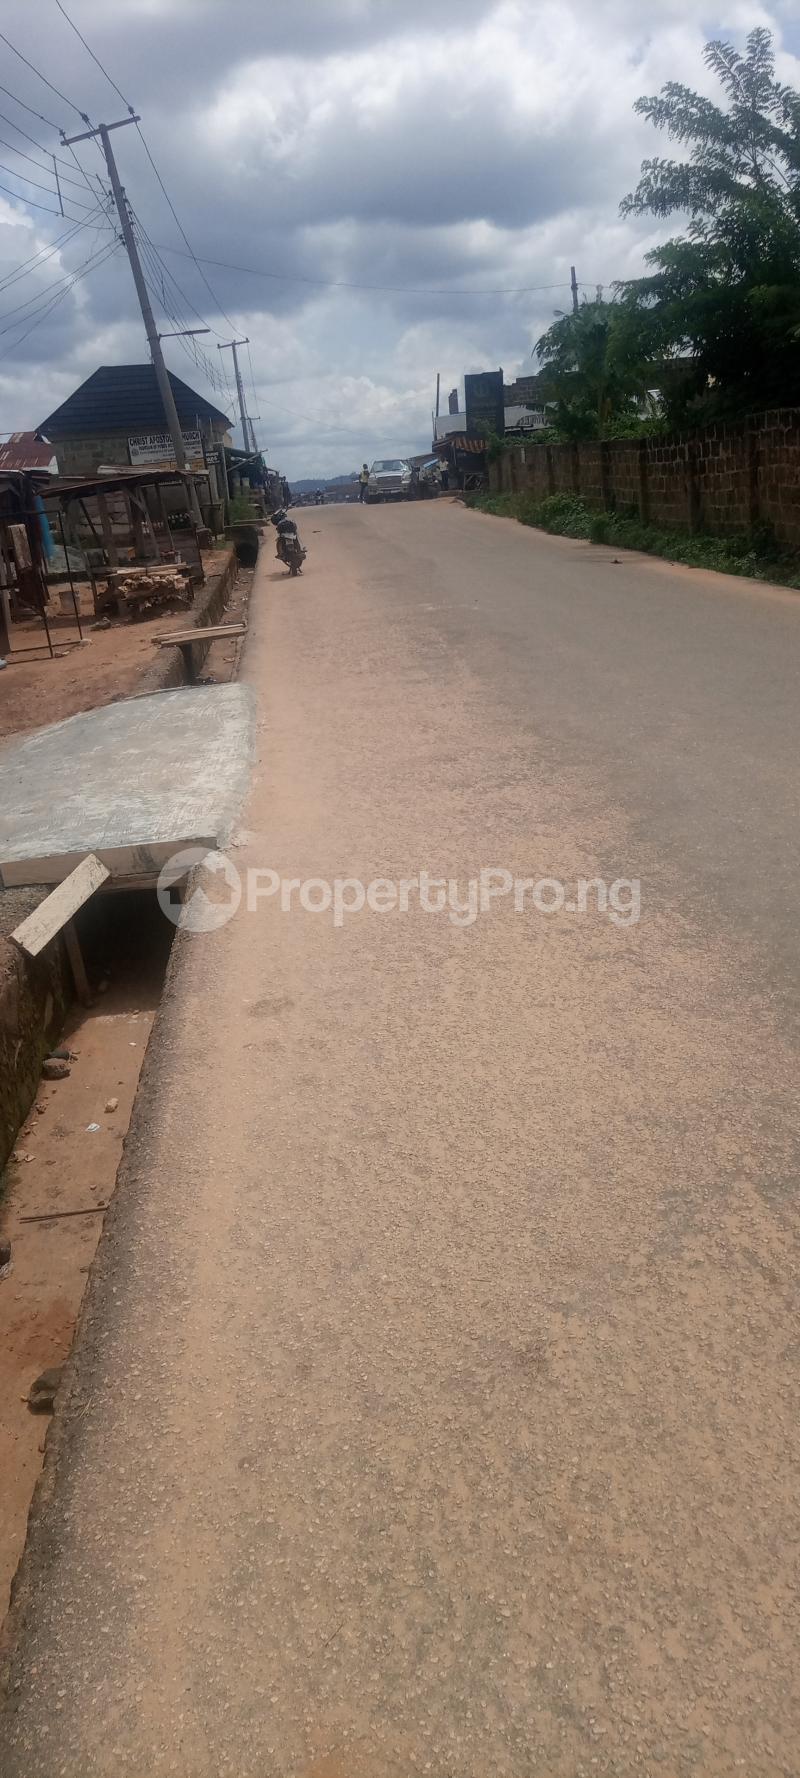 Residential Land for sale Gani Fawehinmi Street Ondo Ondo West Ondo - 2